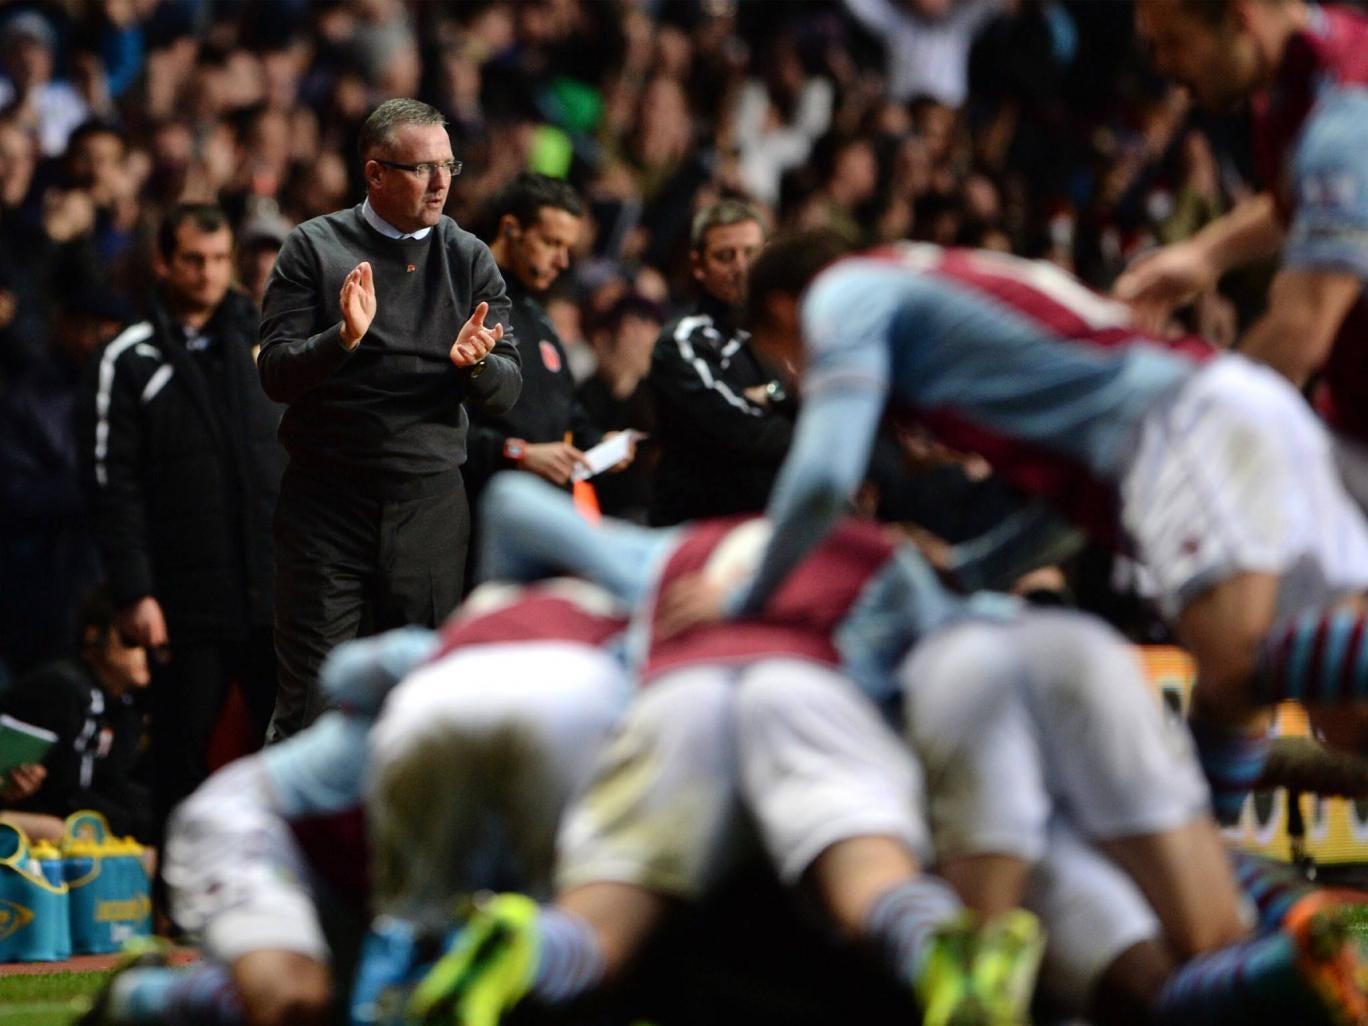 Paul Lambert the Aston Villa manager applauds his players following Leandro Bacuna of Aston Villa opening goal